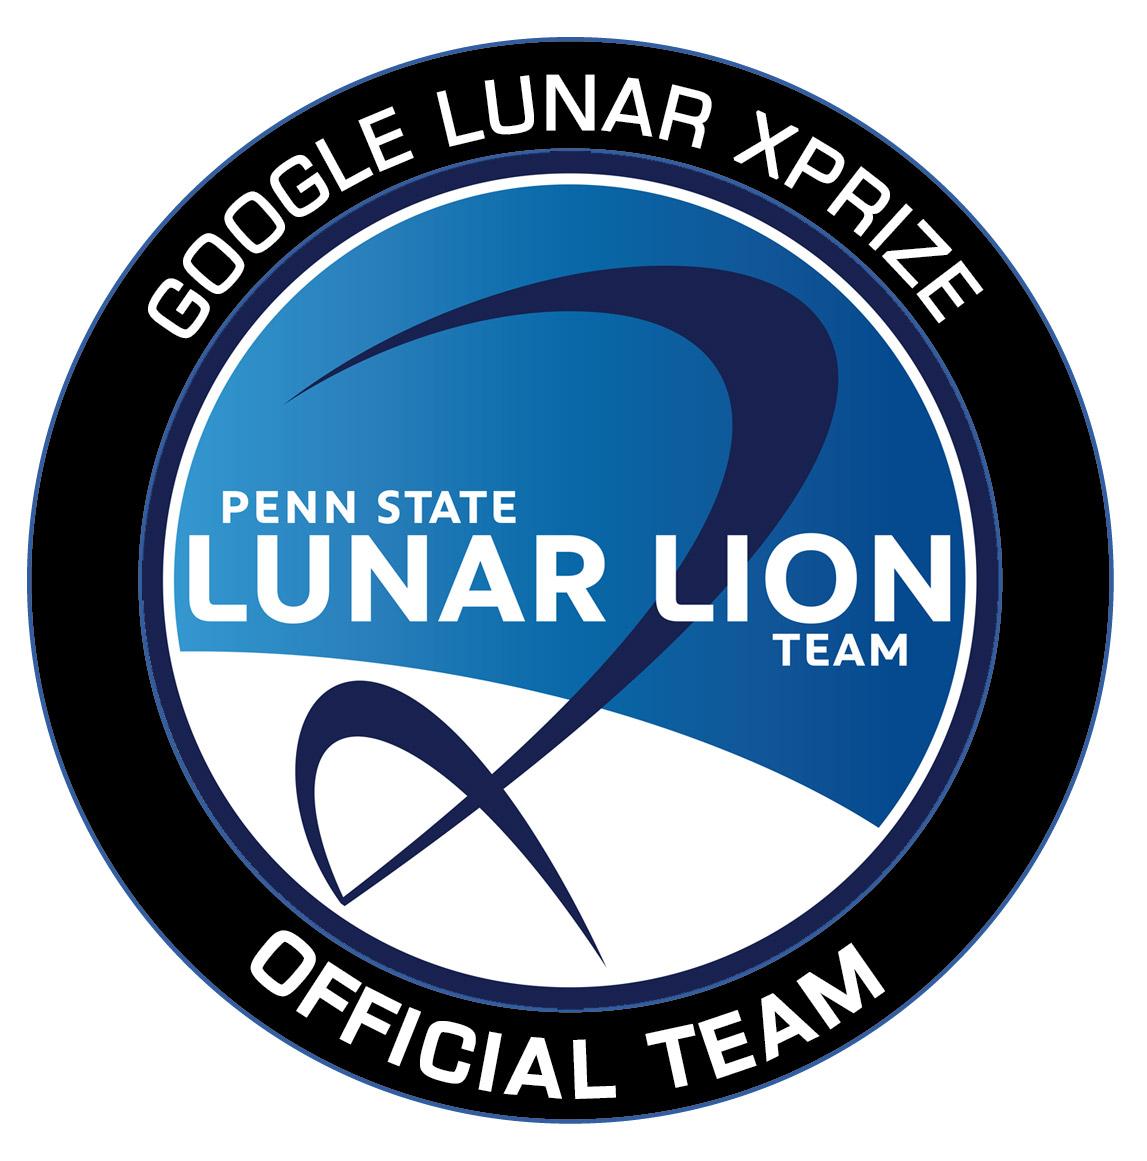 Penn-State-Lunar-Lion-Team-Logo